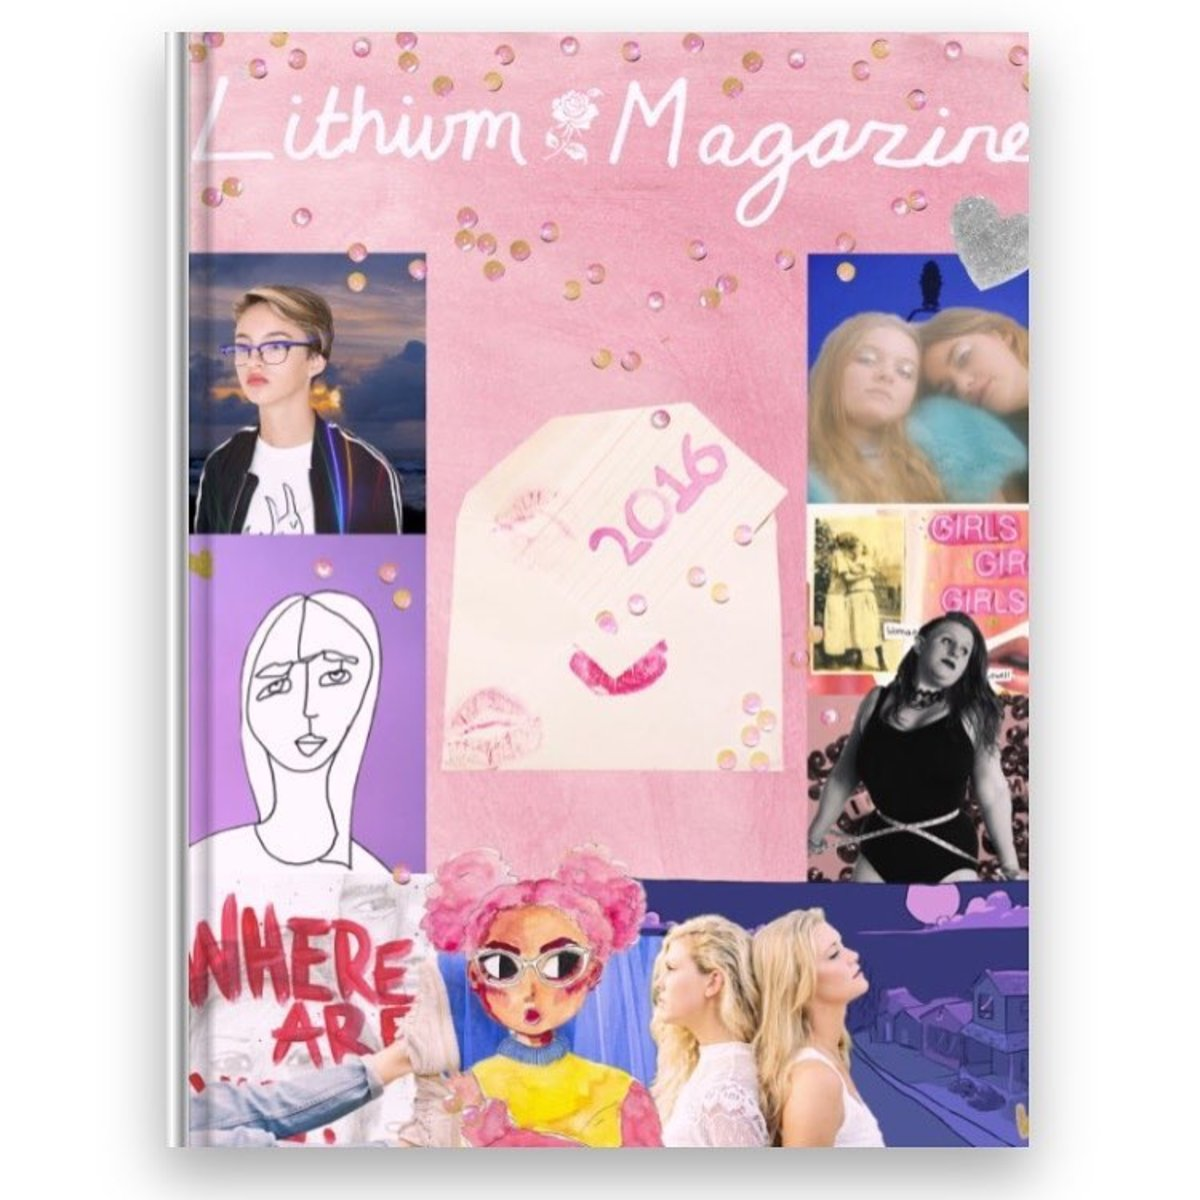 Lithium Magazine's 2016 yearbook. Photo: Kathryn Zix/@lithiumagazine/Instagram